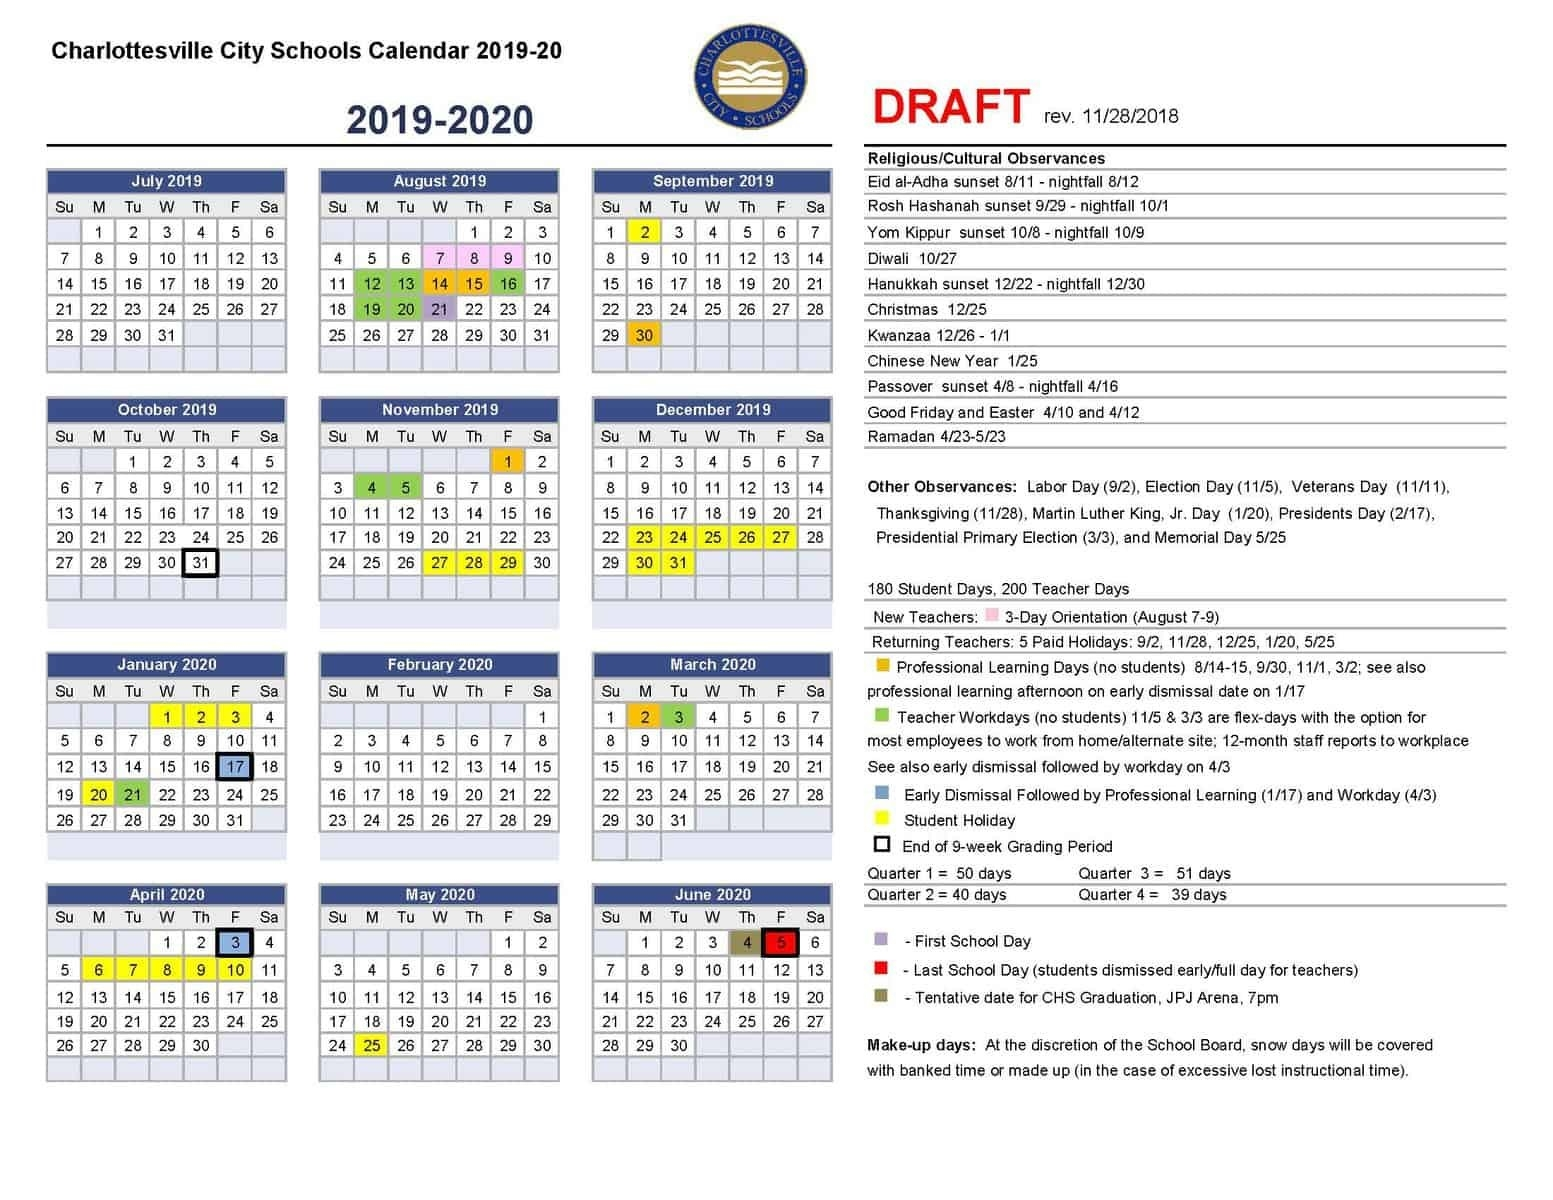 Draft Calendar For 2019-20 | Charlottesville City Schools School Calendar 2019-20